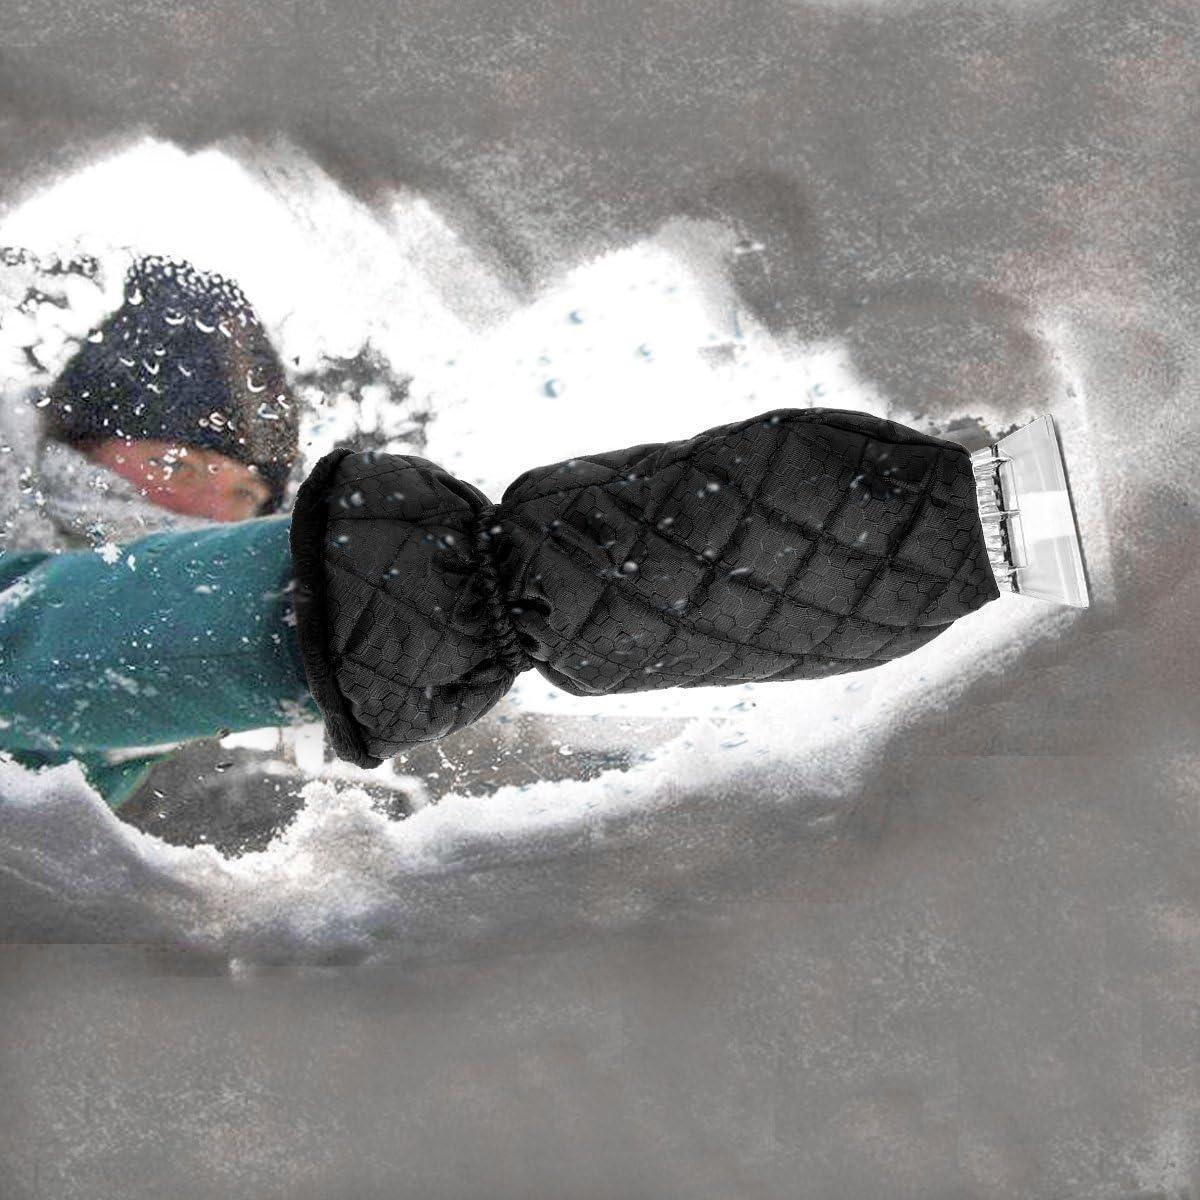 MATCC Ice Scraper Mitt Windshield Snow Scrapers with Waterproof Snow Remover Glove Lined of Thick Fleece Black